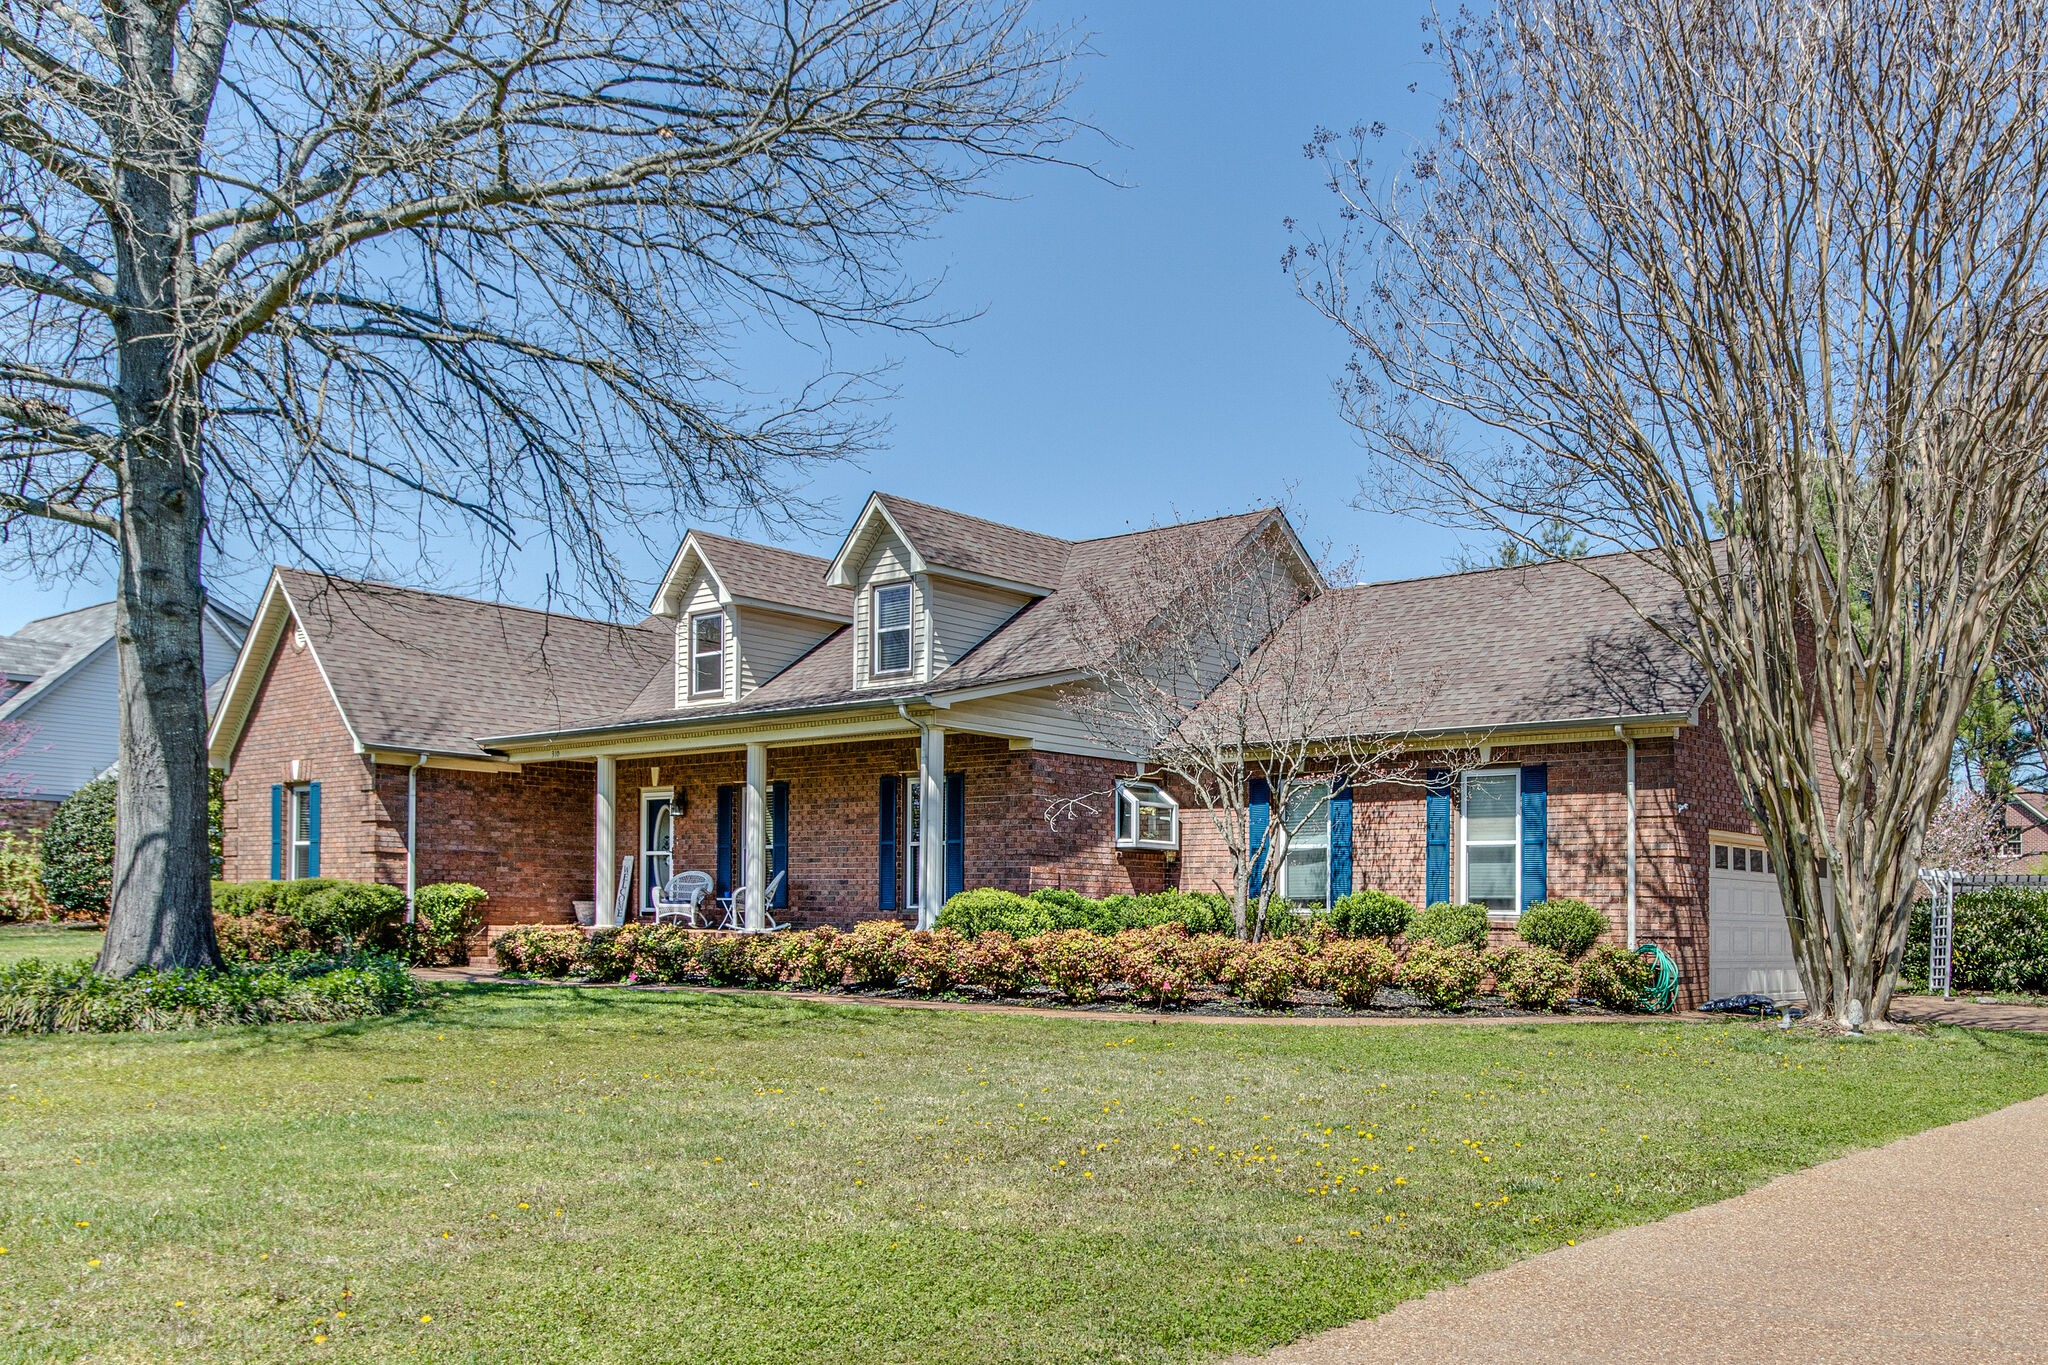 310 Regal Dr Property Photo - Murfreesboro, TN real estate listing